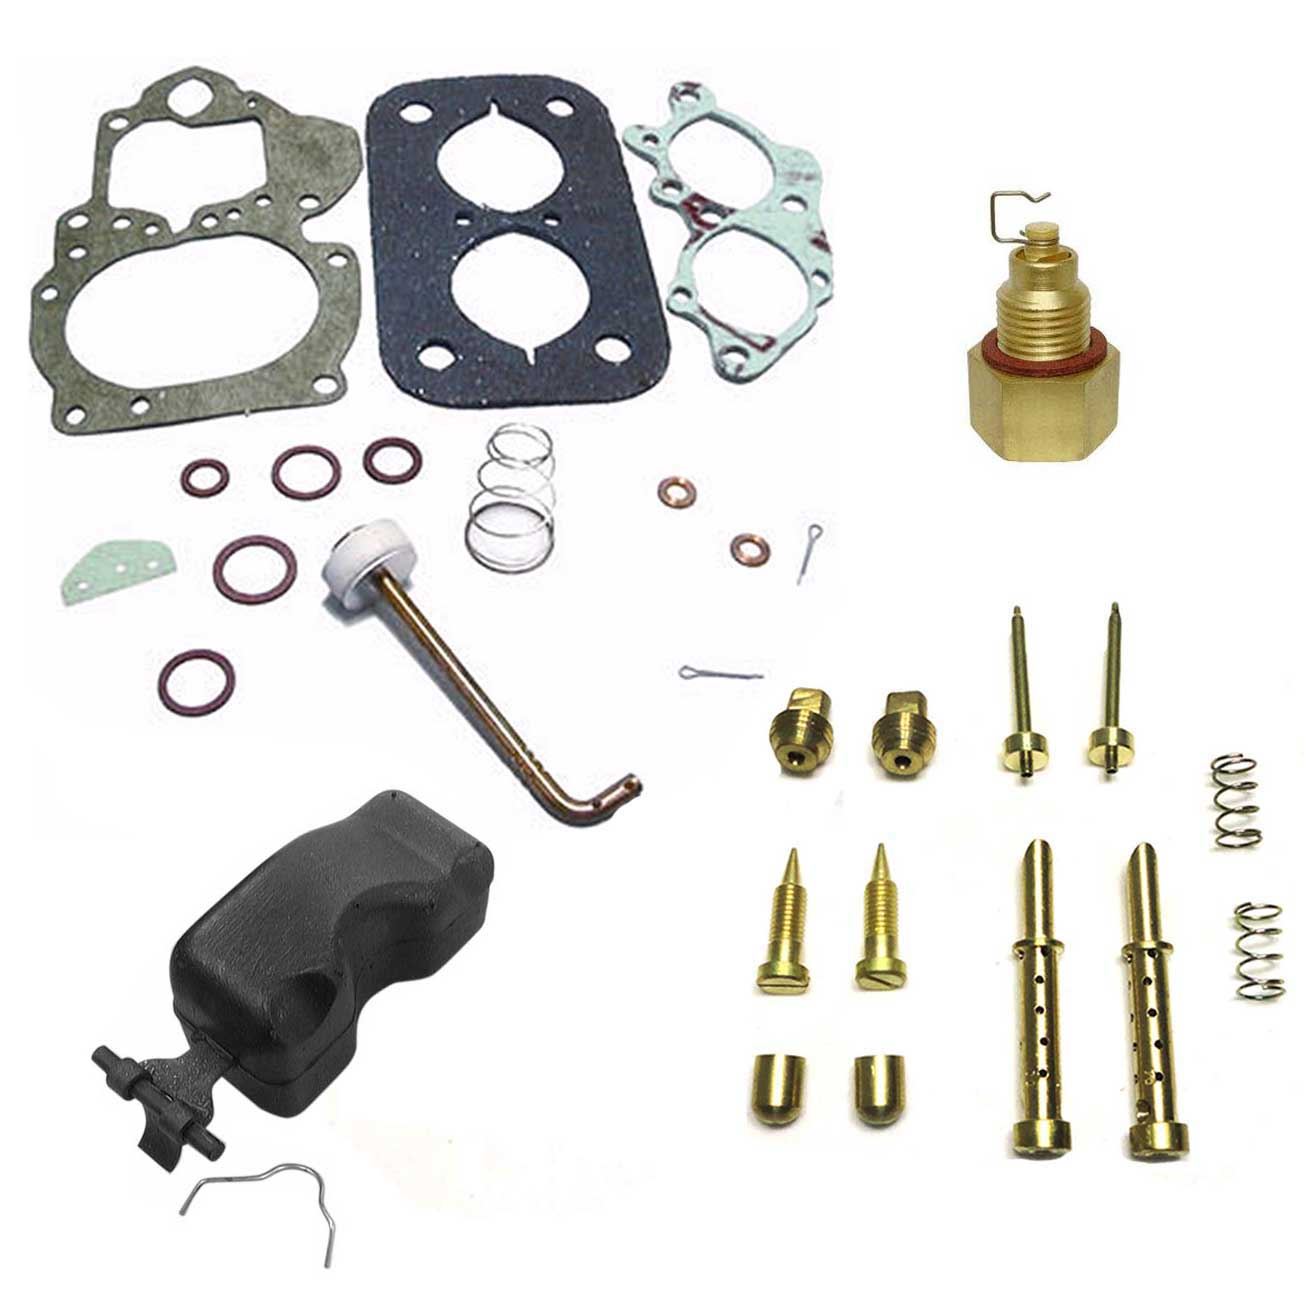 Reparo Carburador Weber DFV 446 Opala 4 e 6cc - Álcool e Gasolina